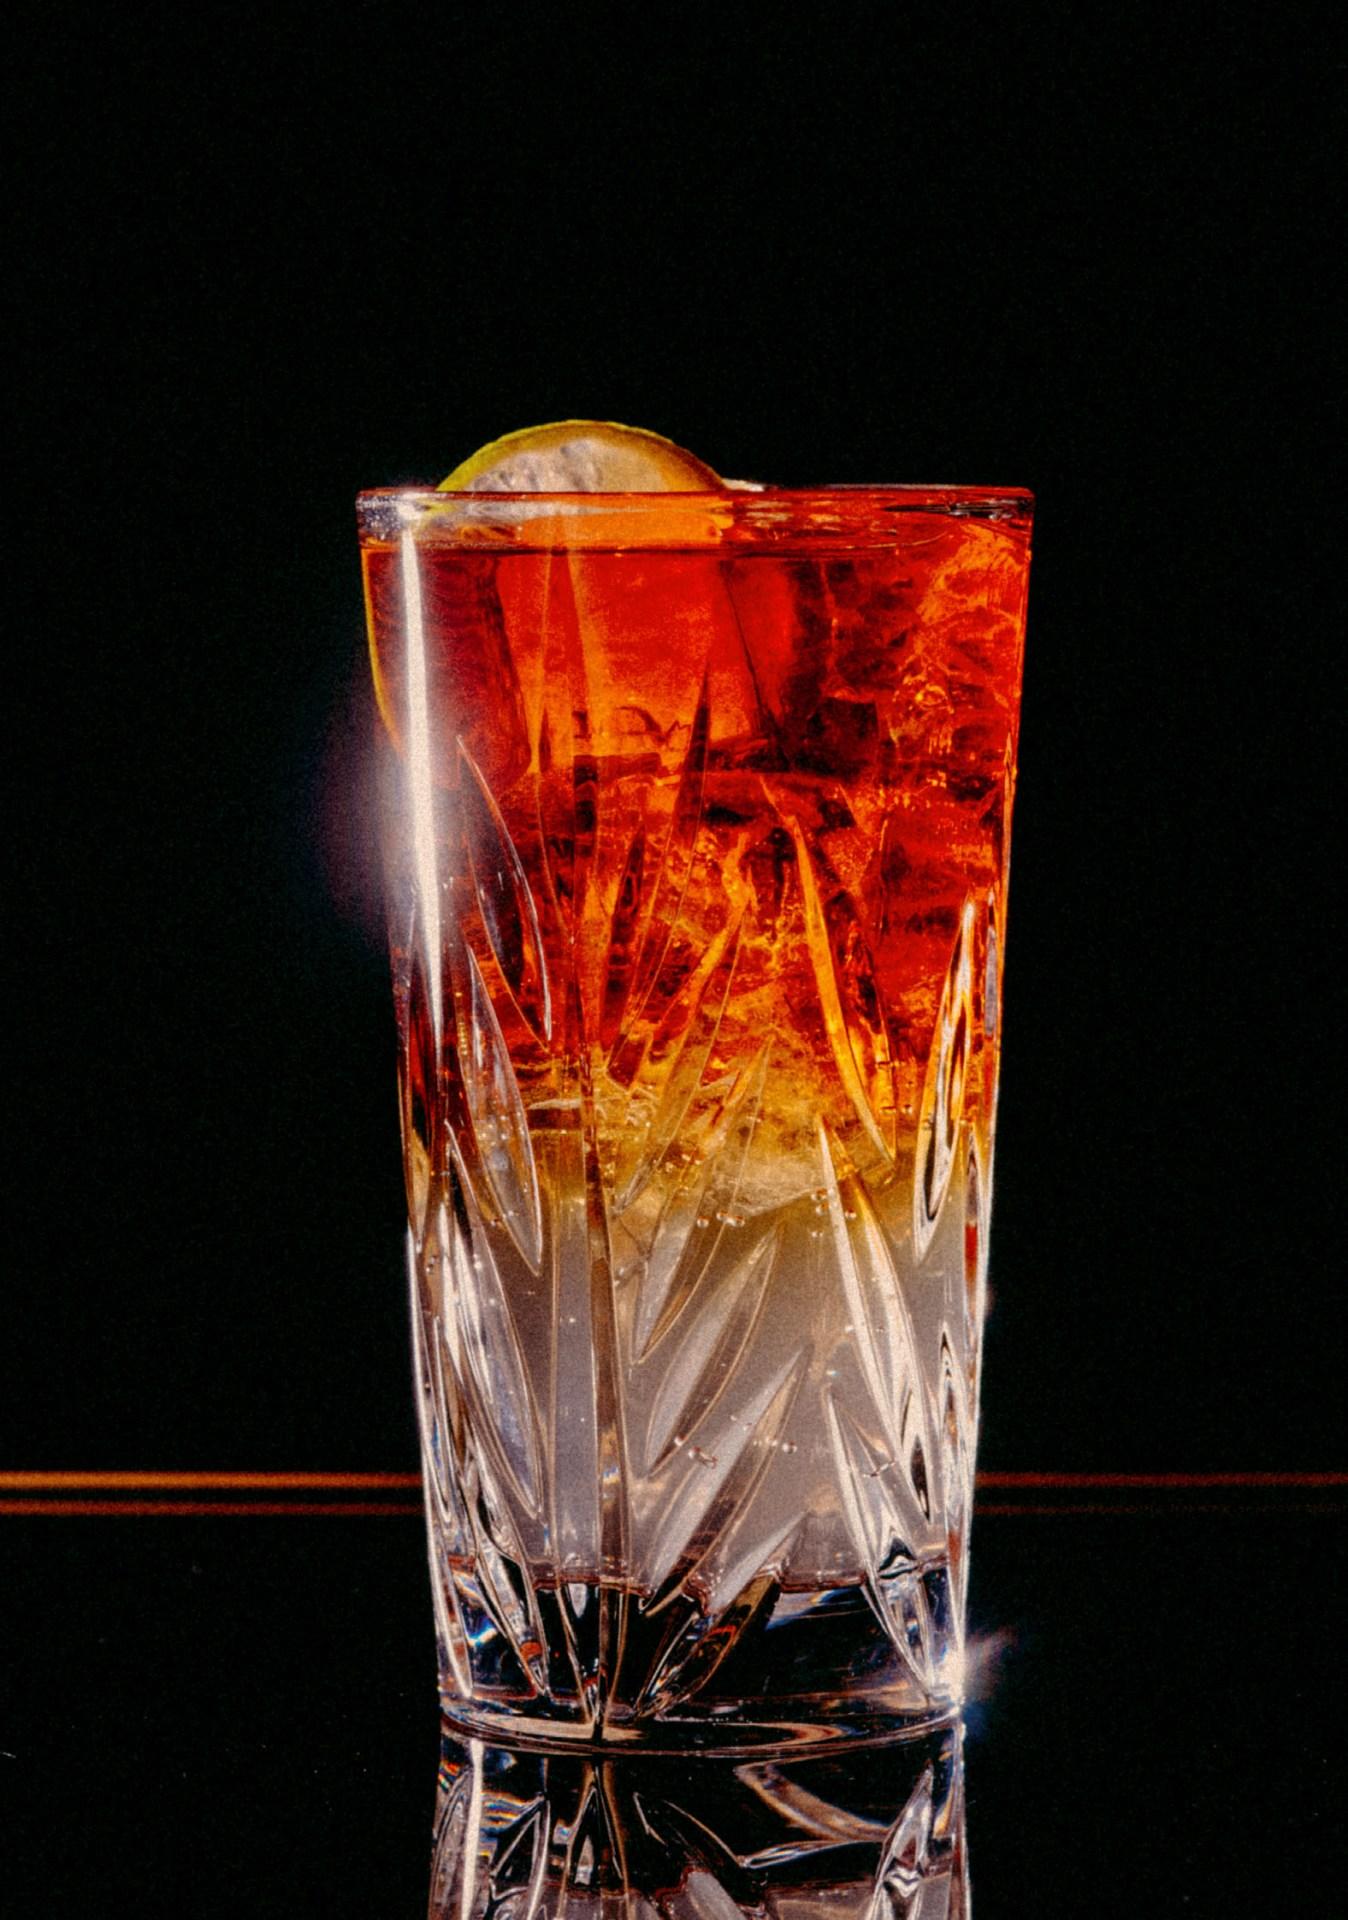 Recipe: 4cl Goslings Black Seal Rum 1cl Lime Juice 10cl Schweppes Ginger Beer